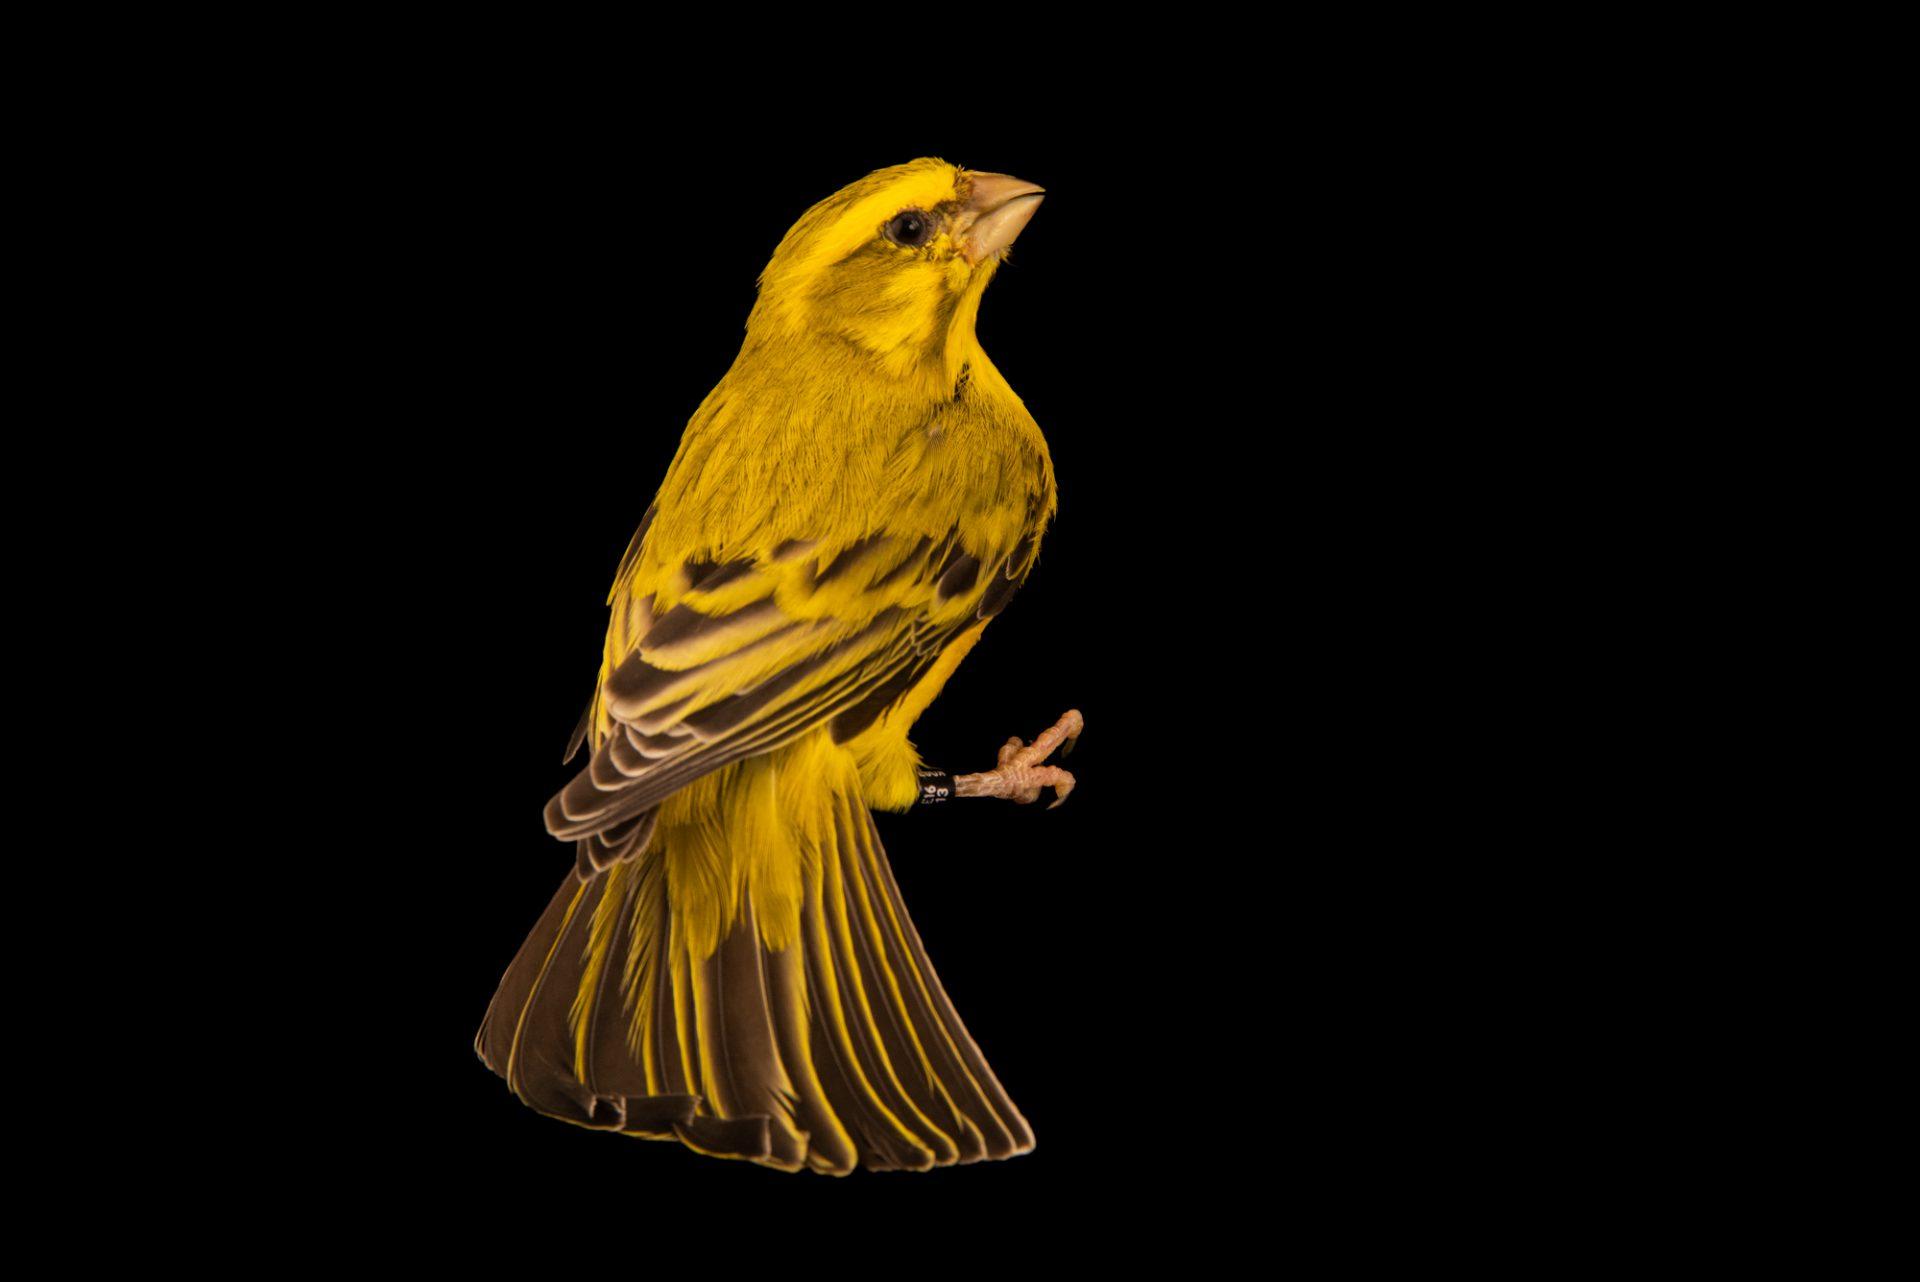 Photo: Yellow canary (Serinus flaviventris) in Santa Cruz, Tenerife, Spain.